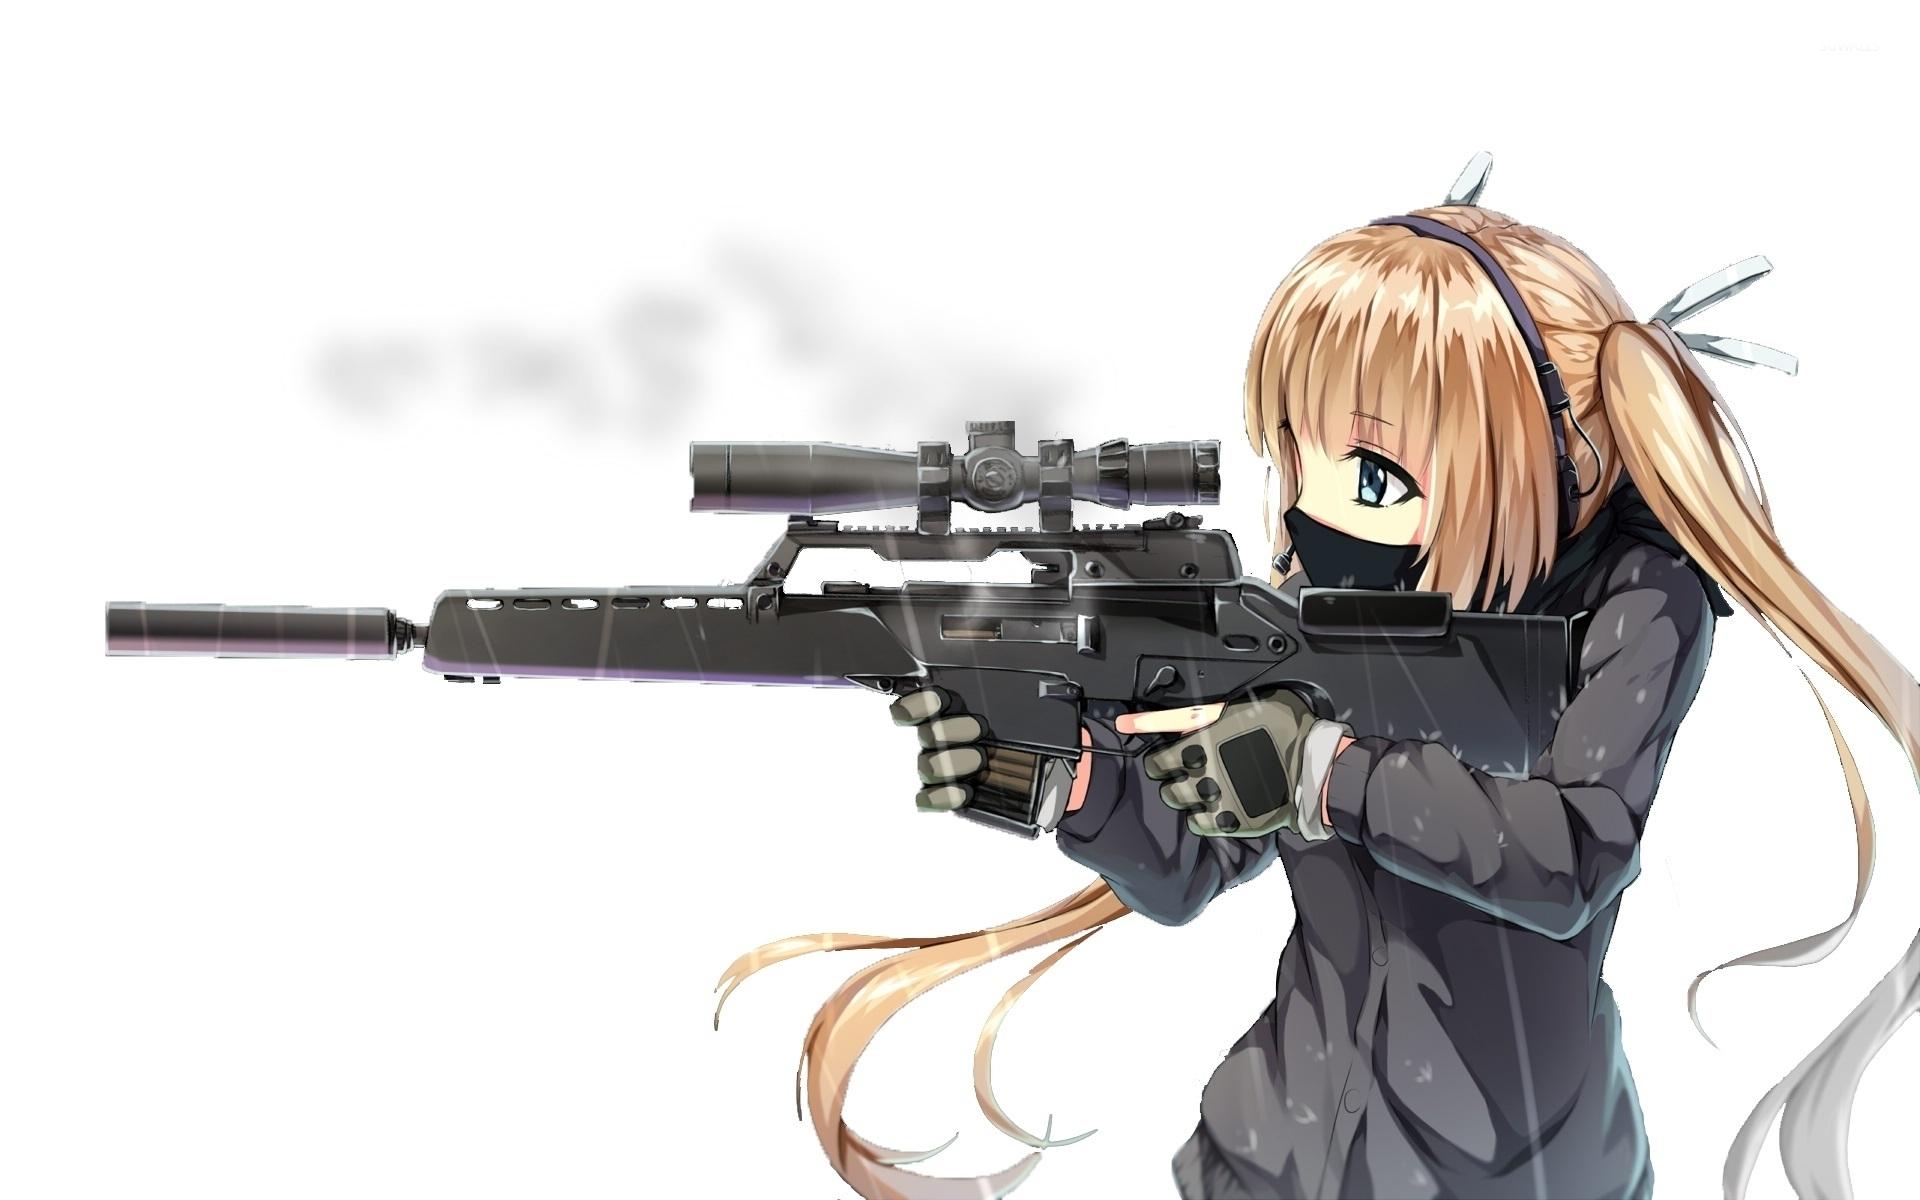 75 sniper wallpaper on wallpapersafari - Anime sniper girl ...